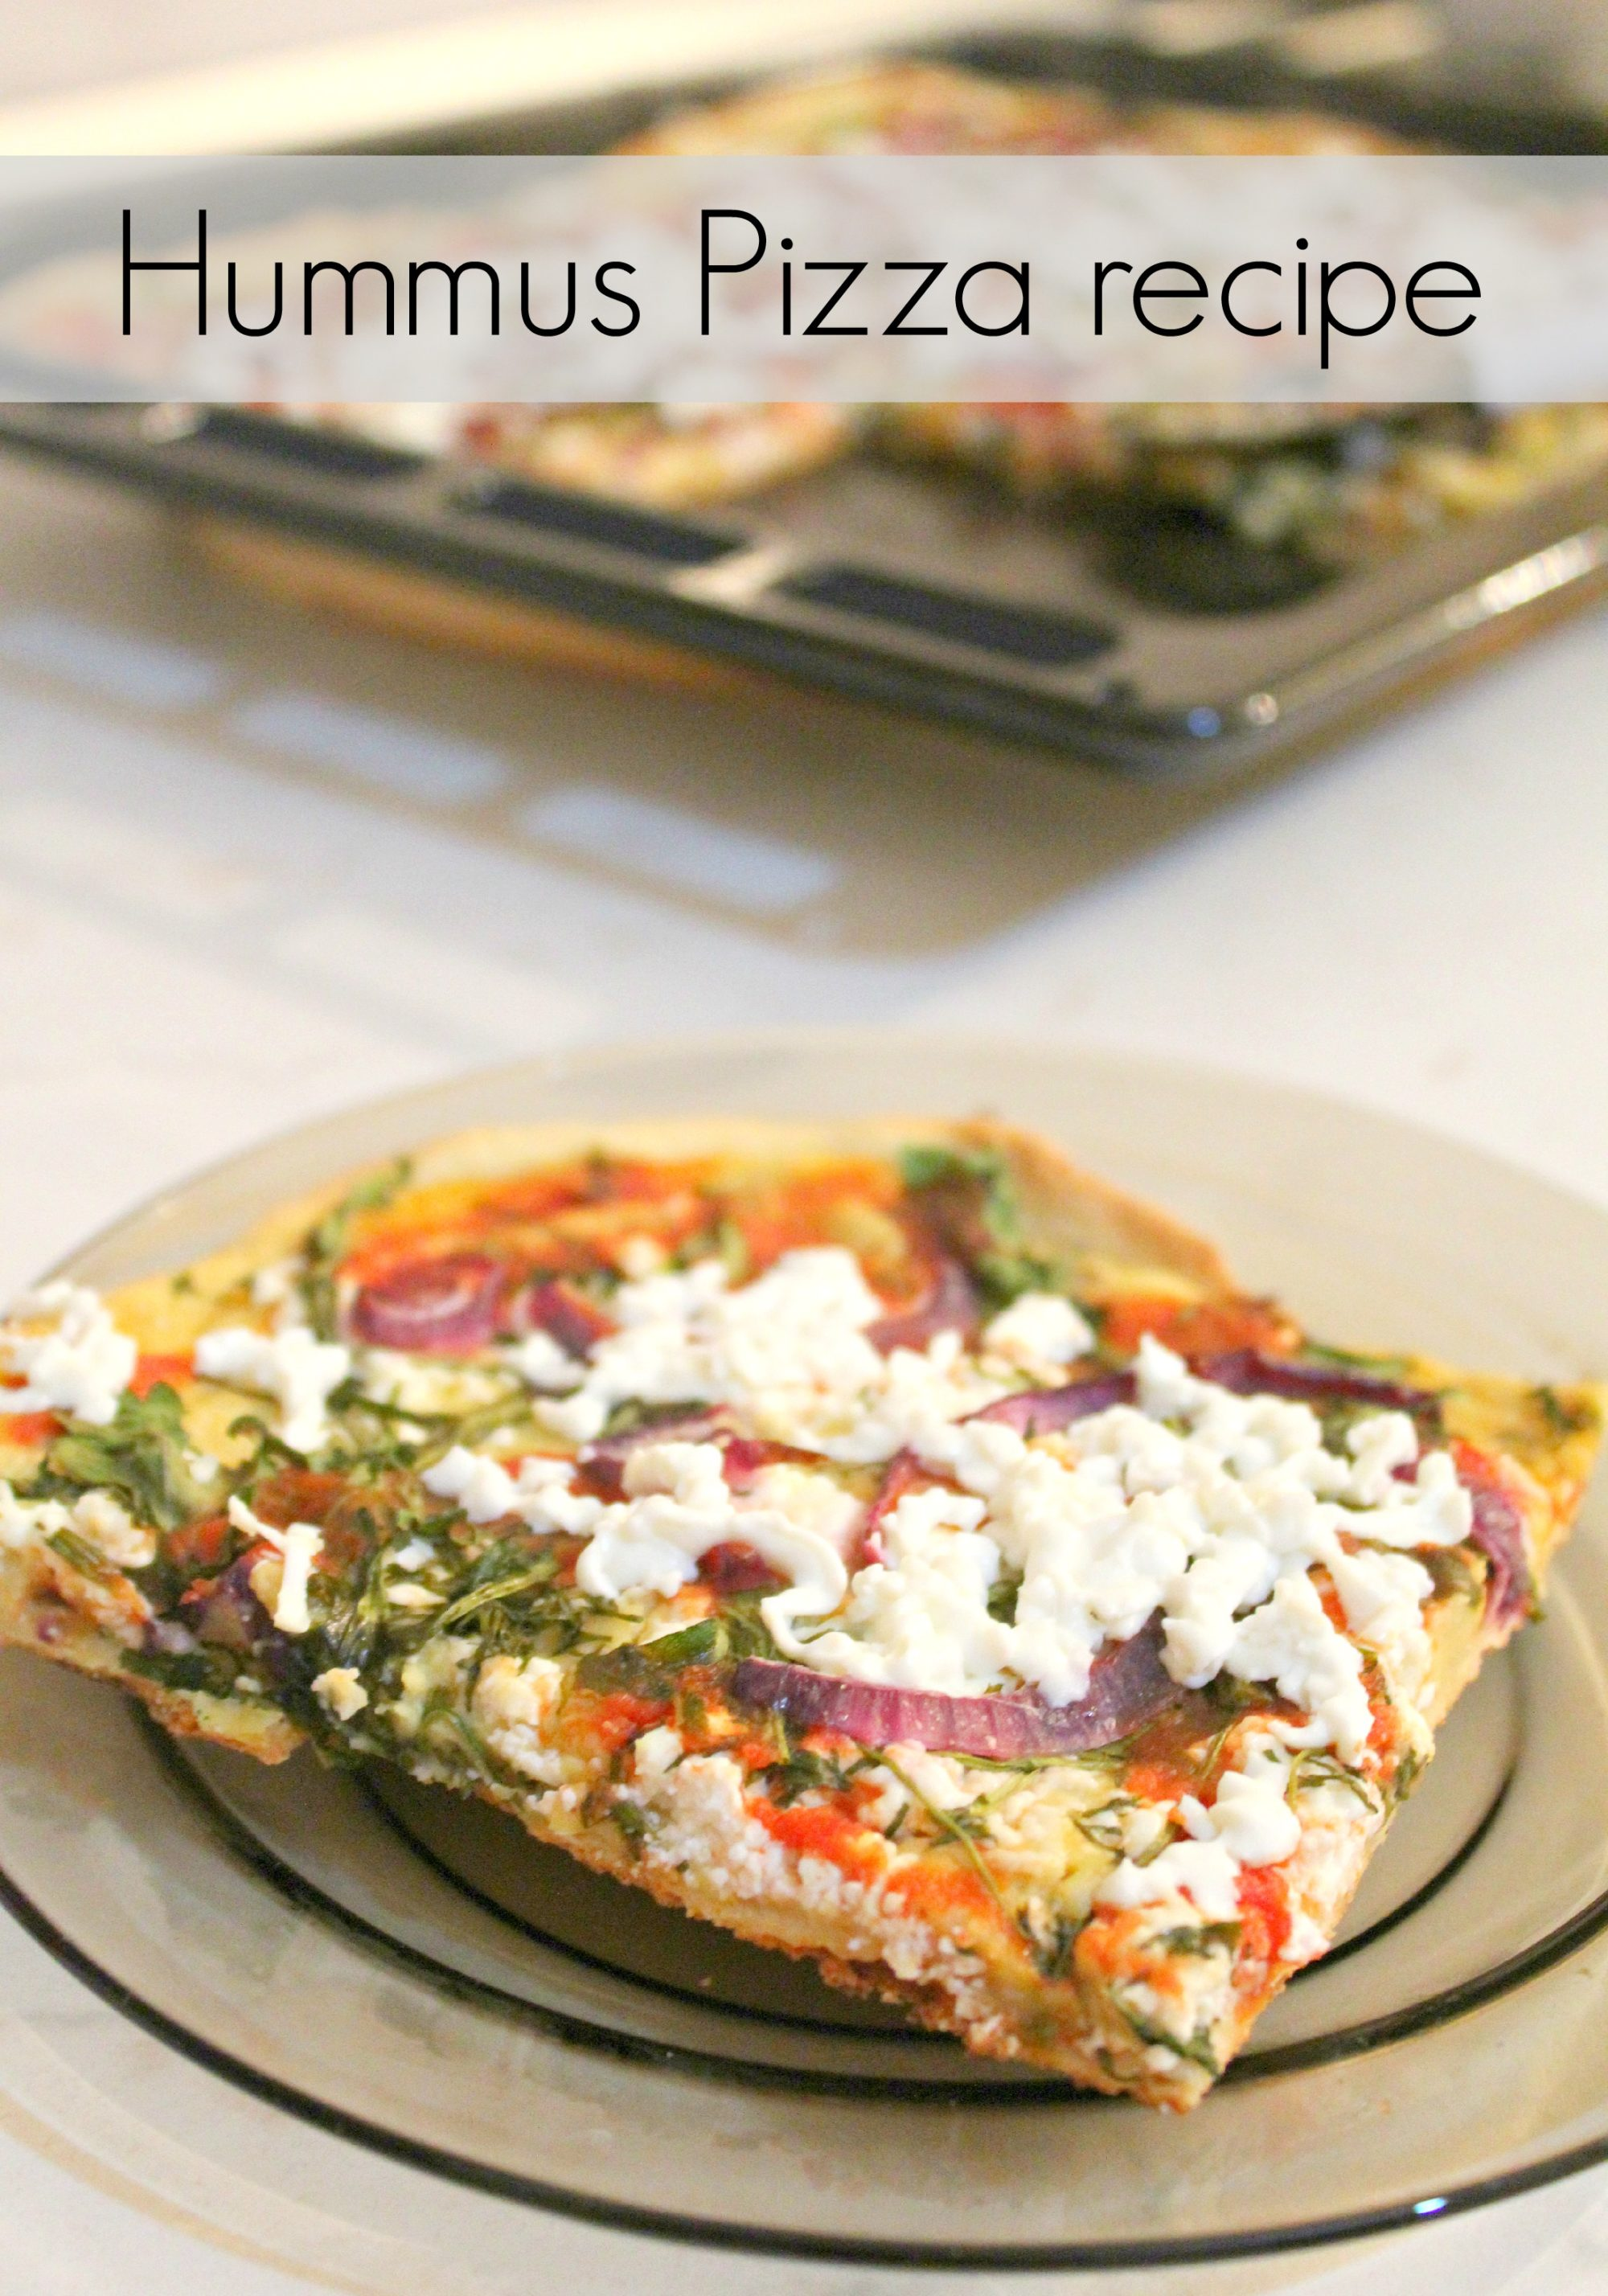 Hummus pizza recipe